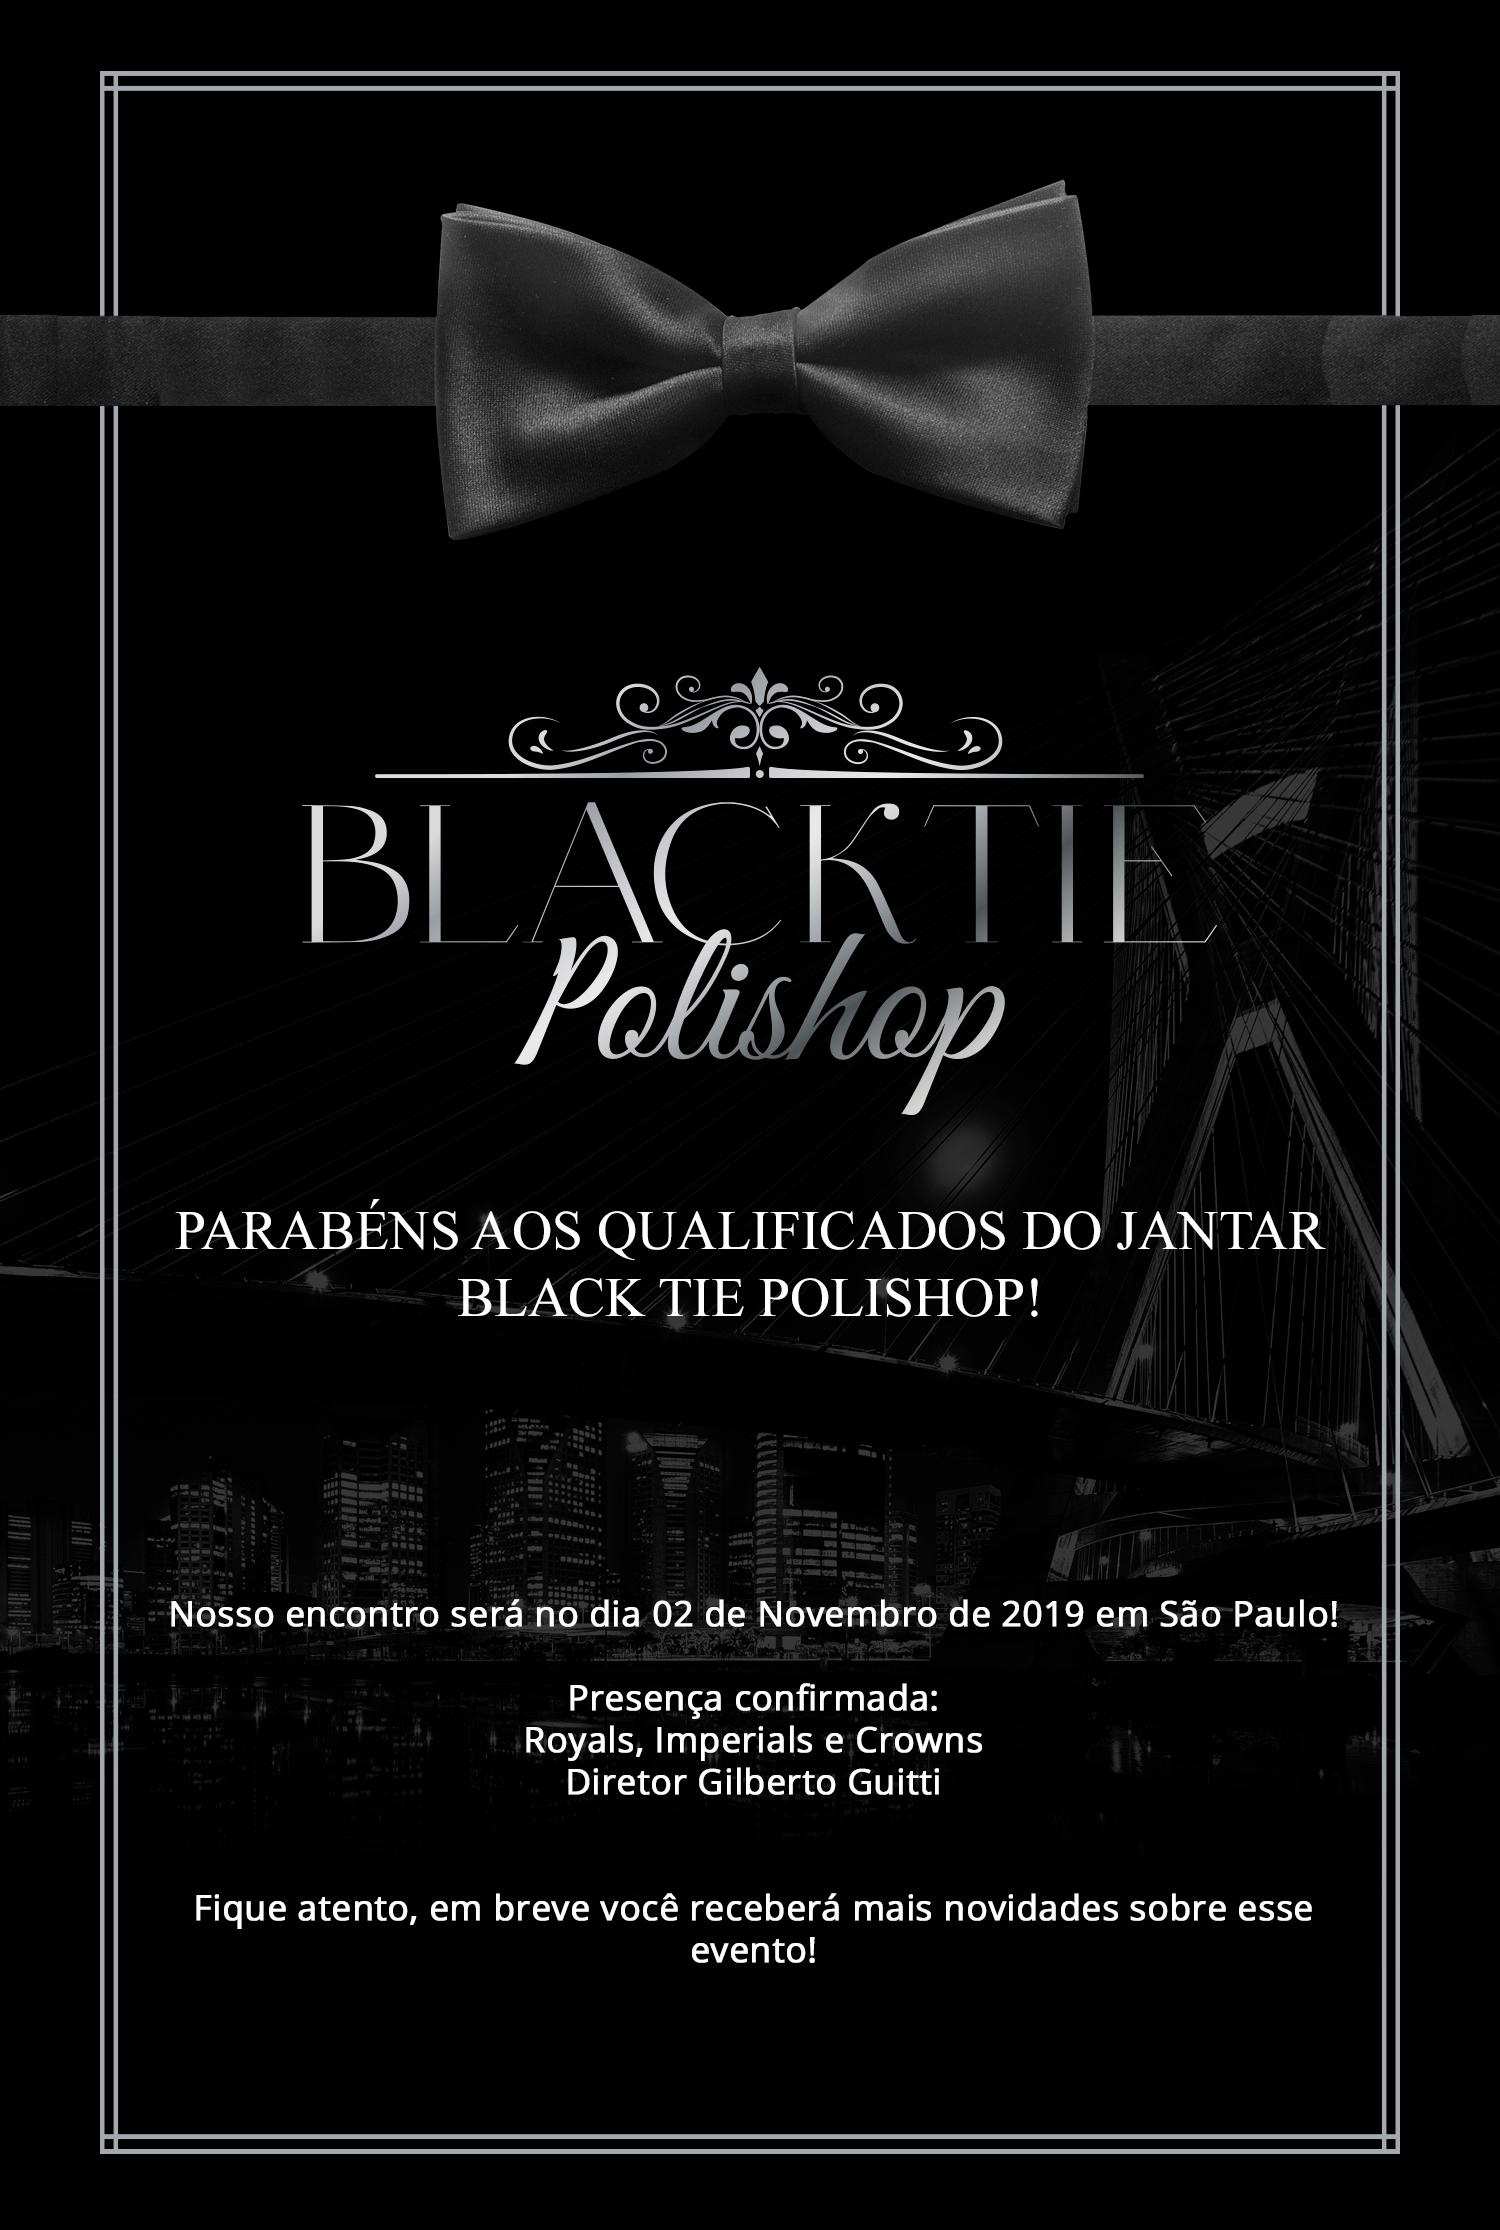 blacktie_002